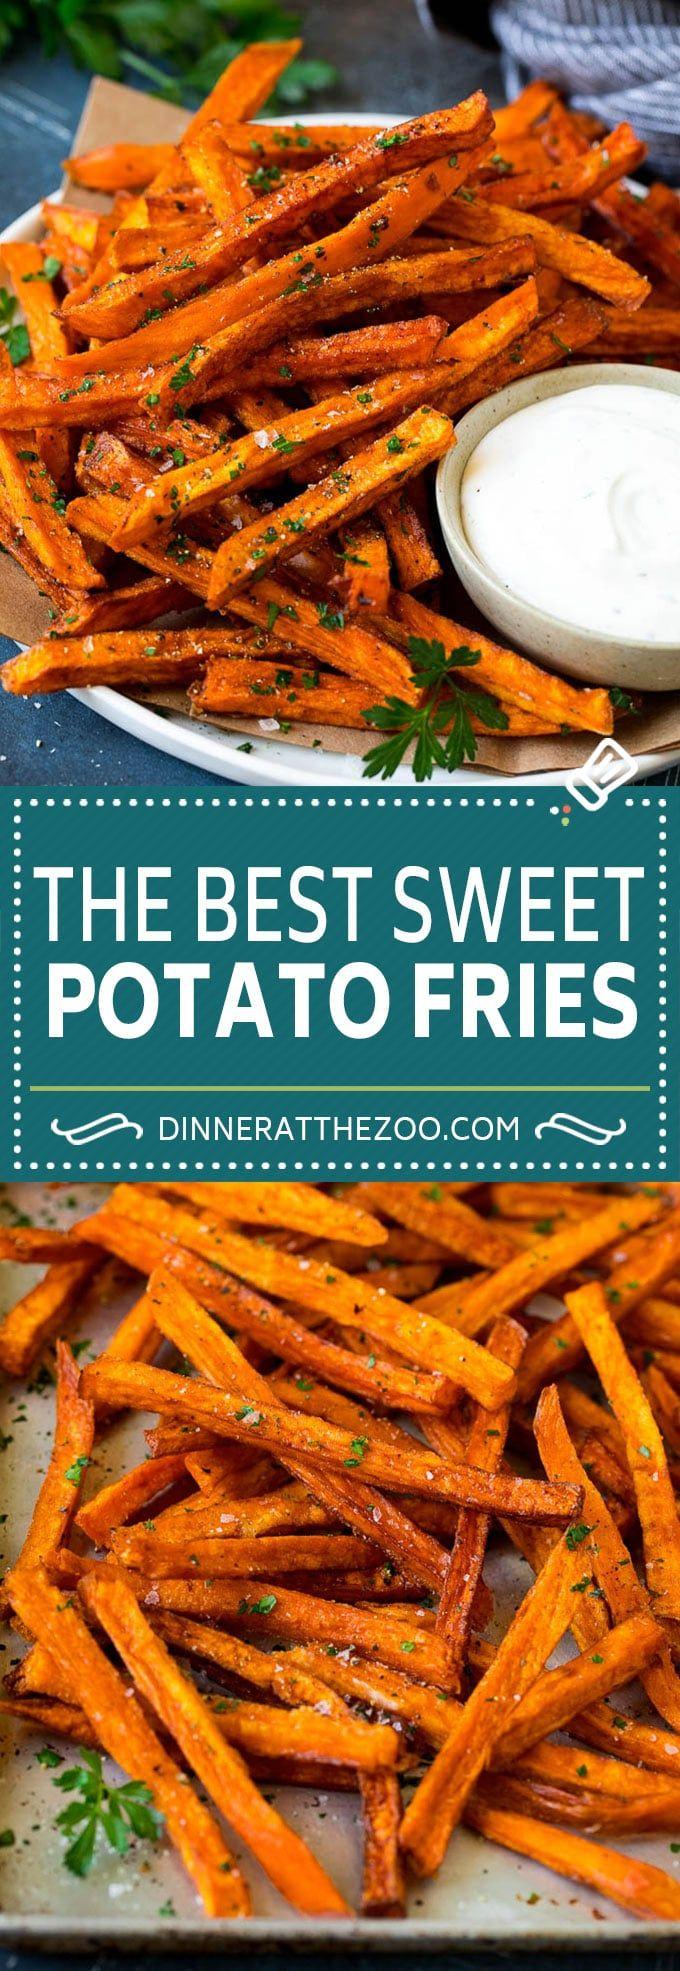 Sweet Potato Fries Recipe | Baked Sweet Potato Fries | Homemade Fries